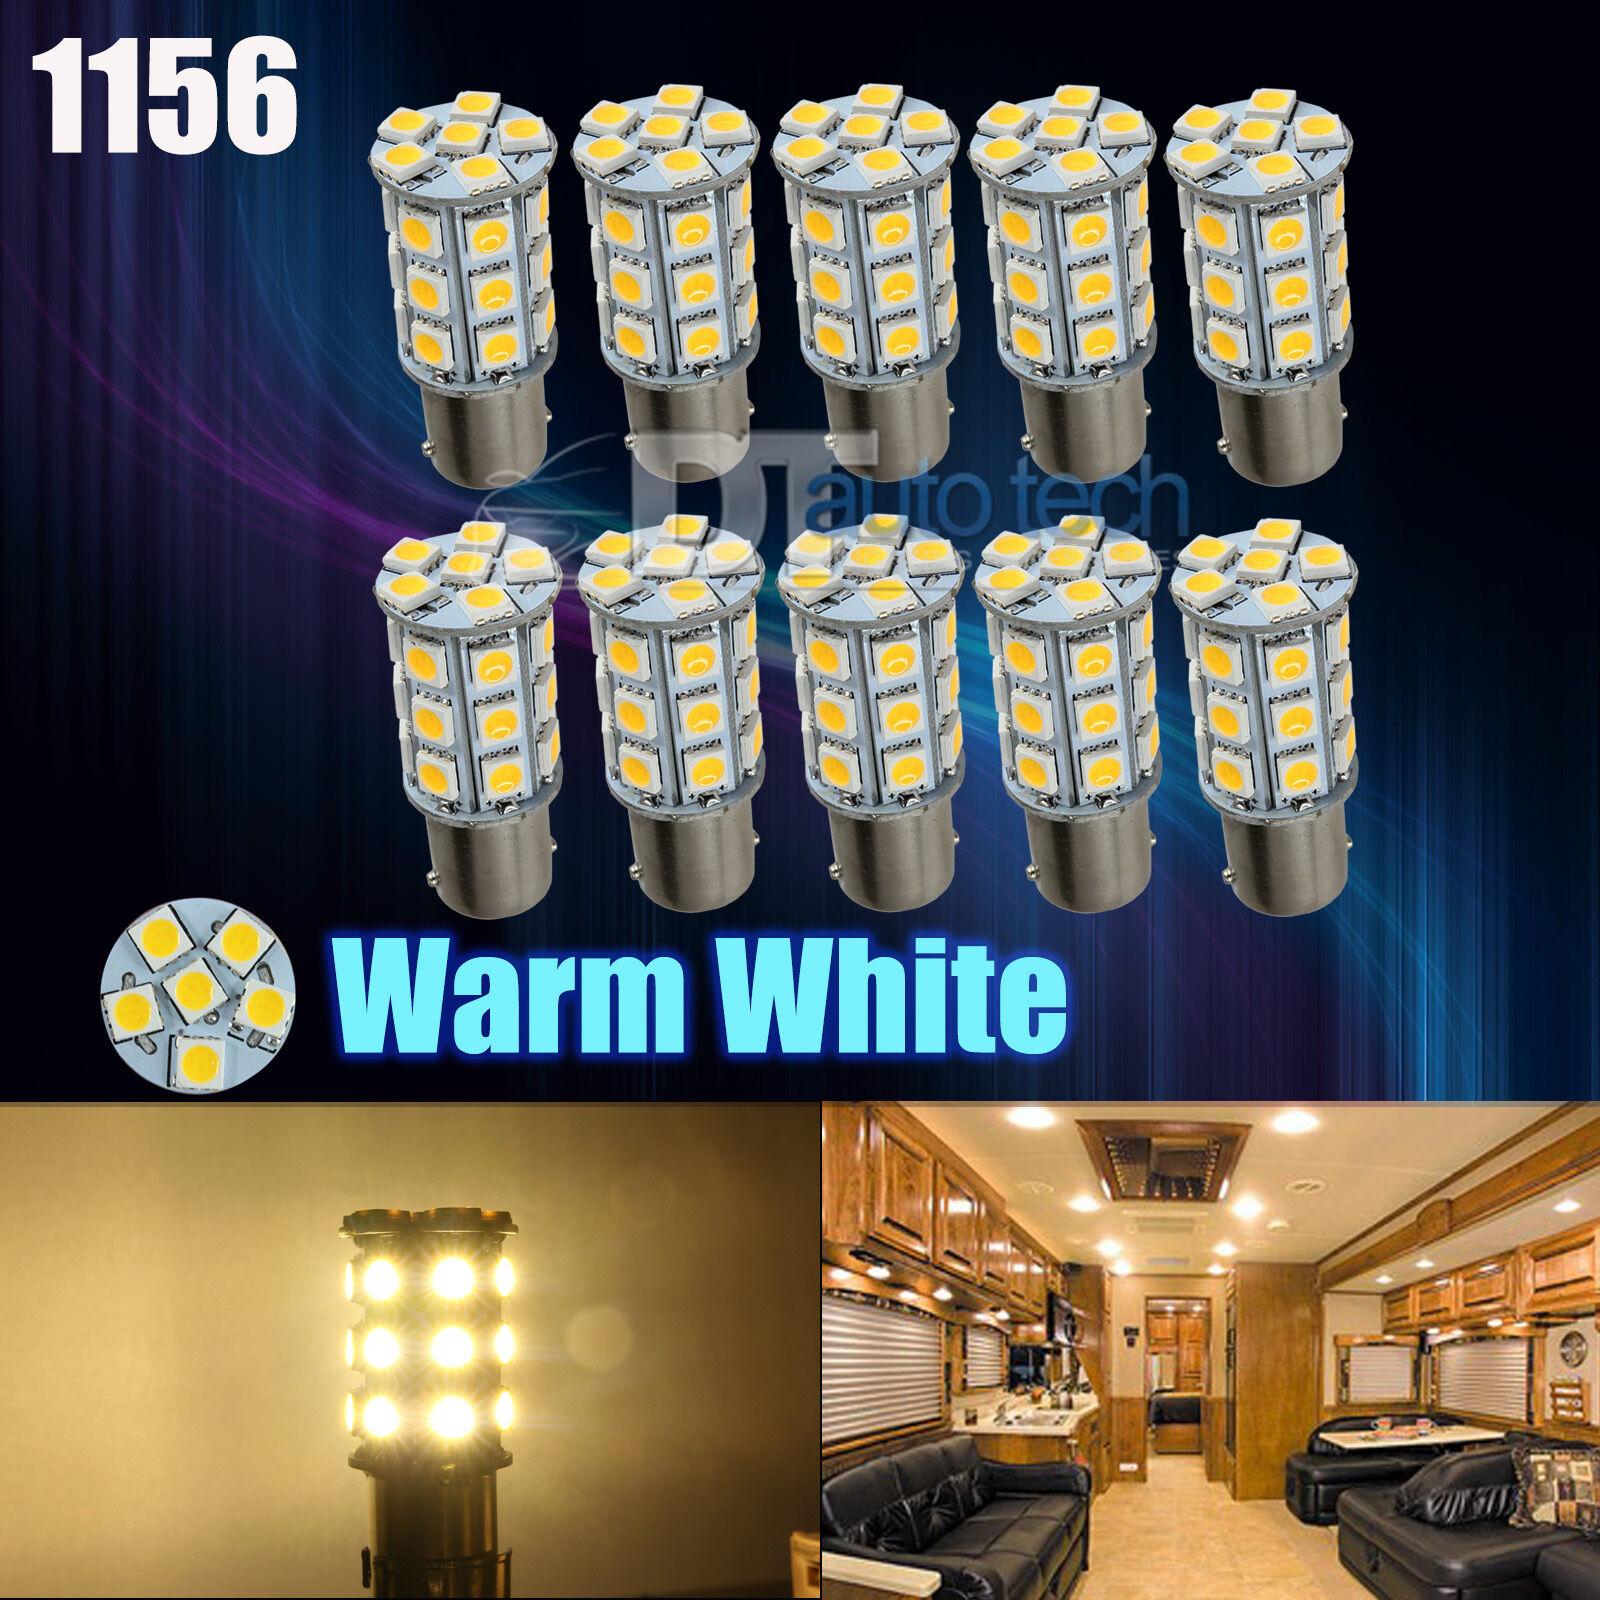 Rv Interior Led Light Bulbs: 10X Warm White 27 SMD LED 1156 1141 1003 RV Camper Trailer Interior Light  Bulbs,Lighting